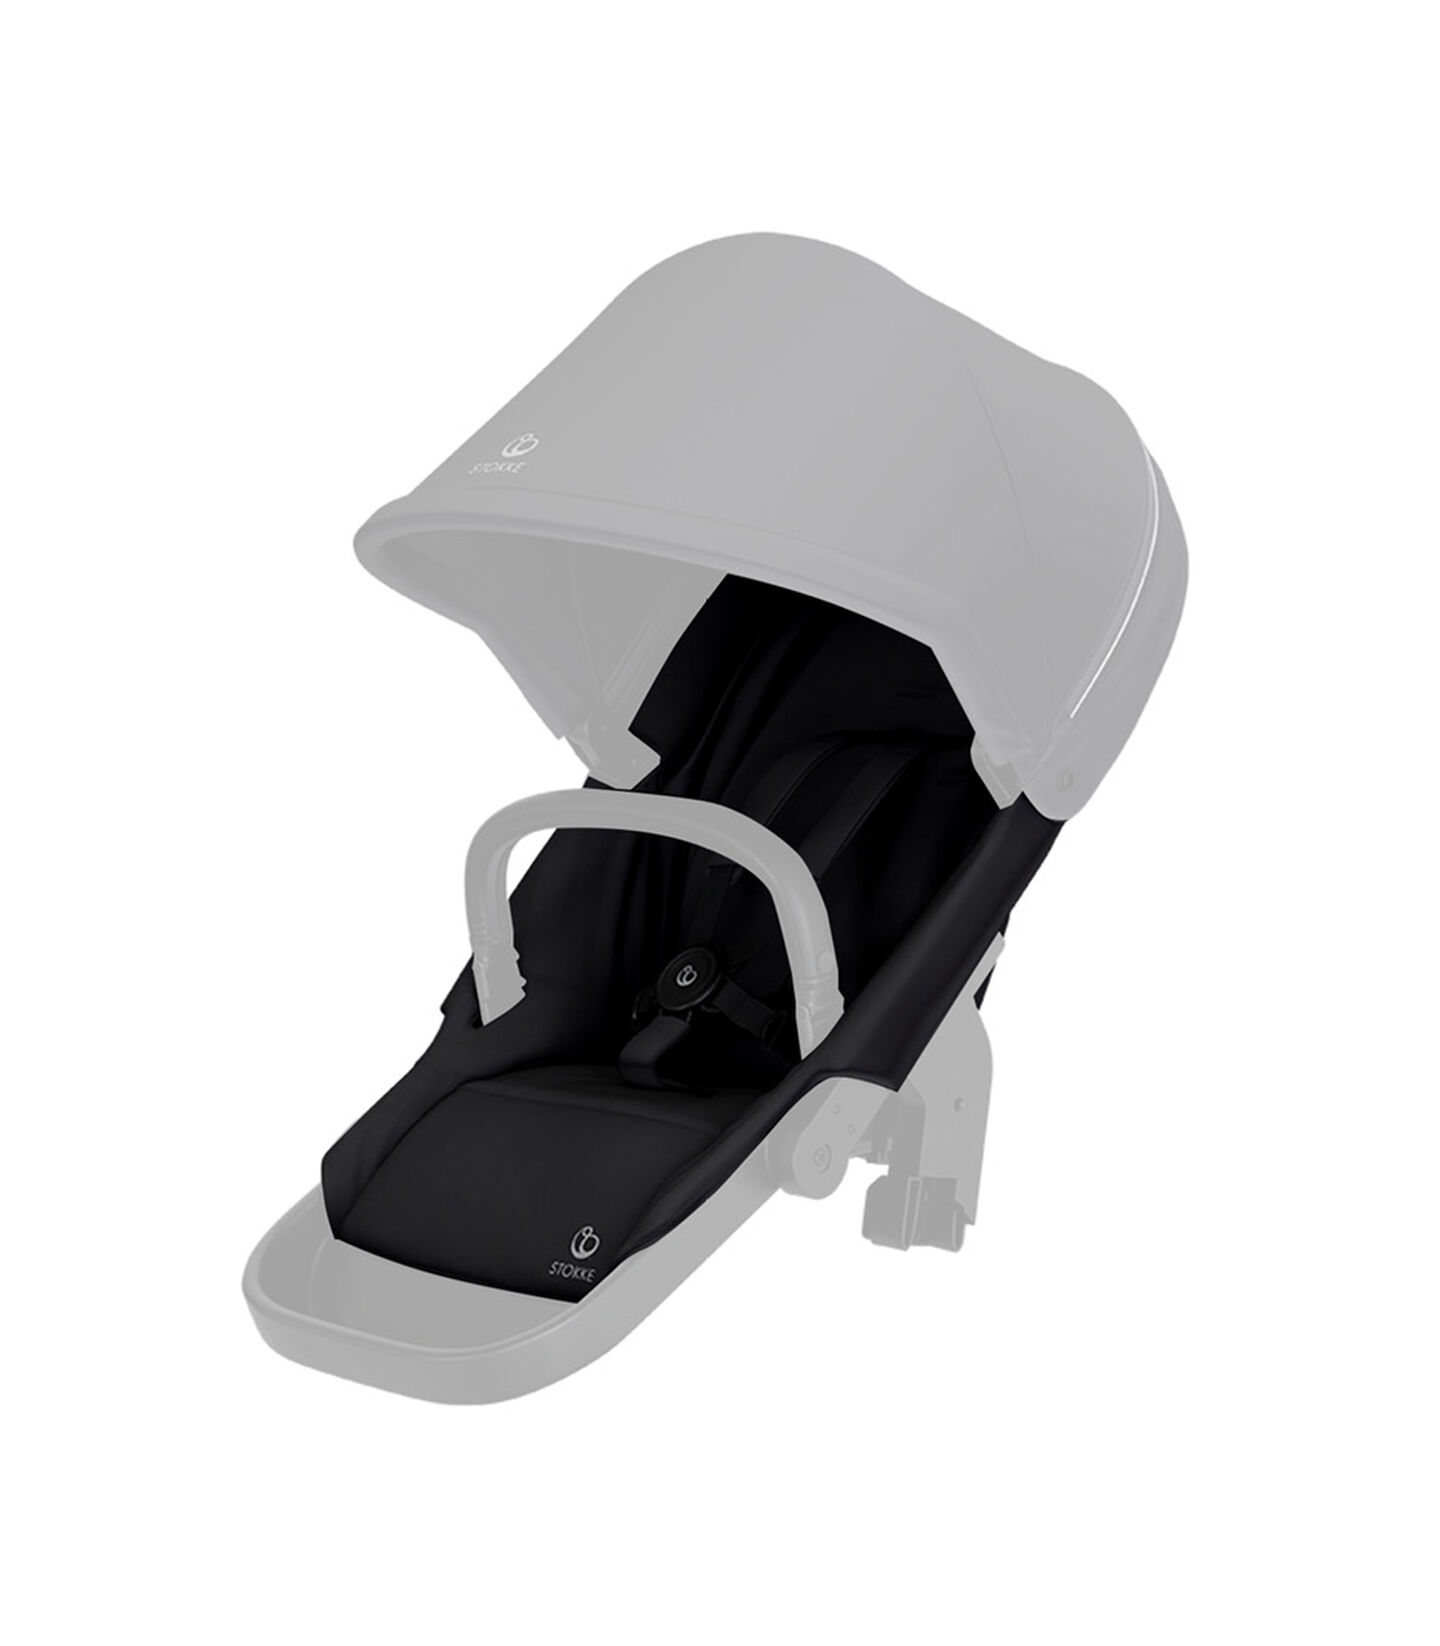 Stokke® Beat seat textile BlackMel wo Can Harness Shpg Baske, Noir mélange, mainview view 2